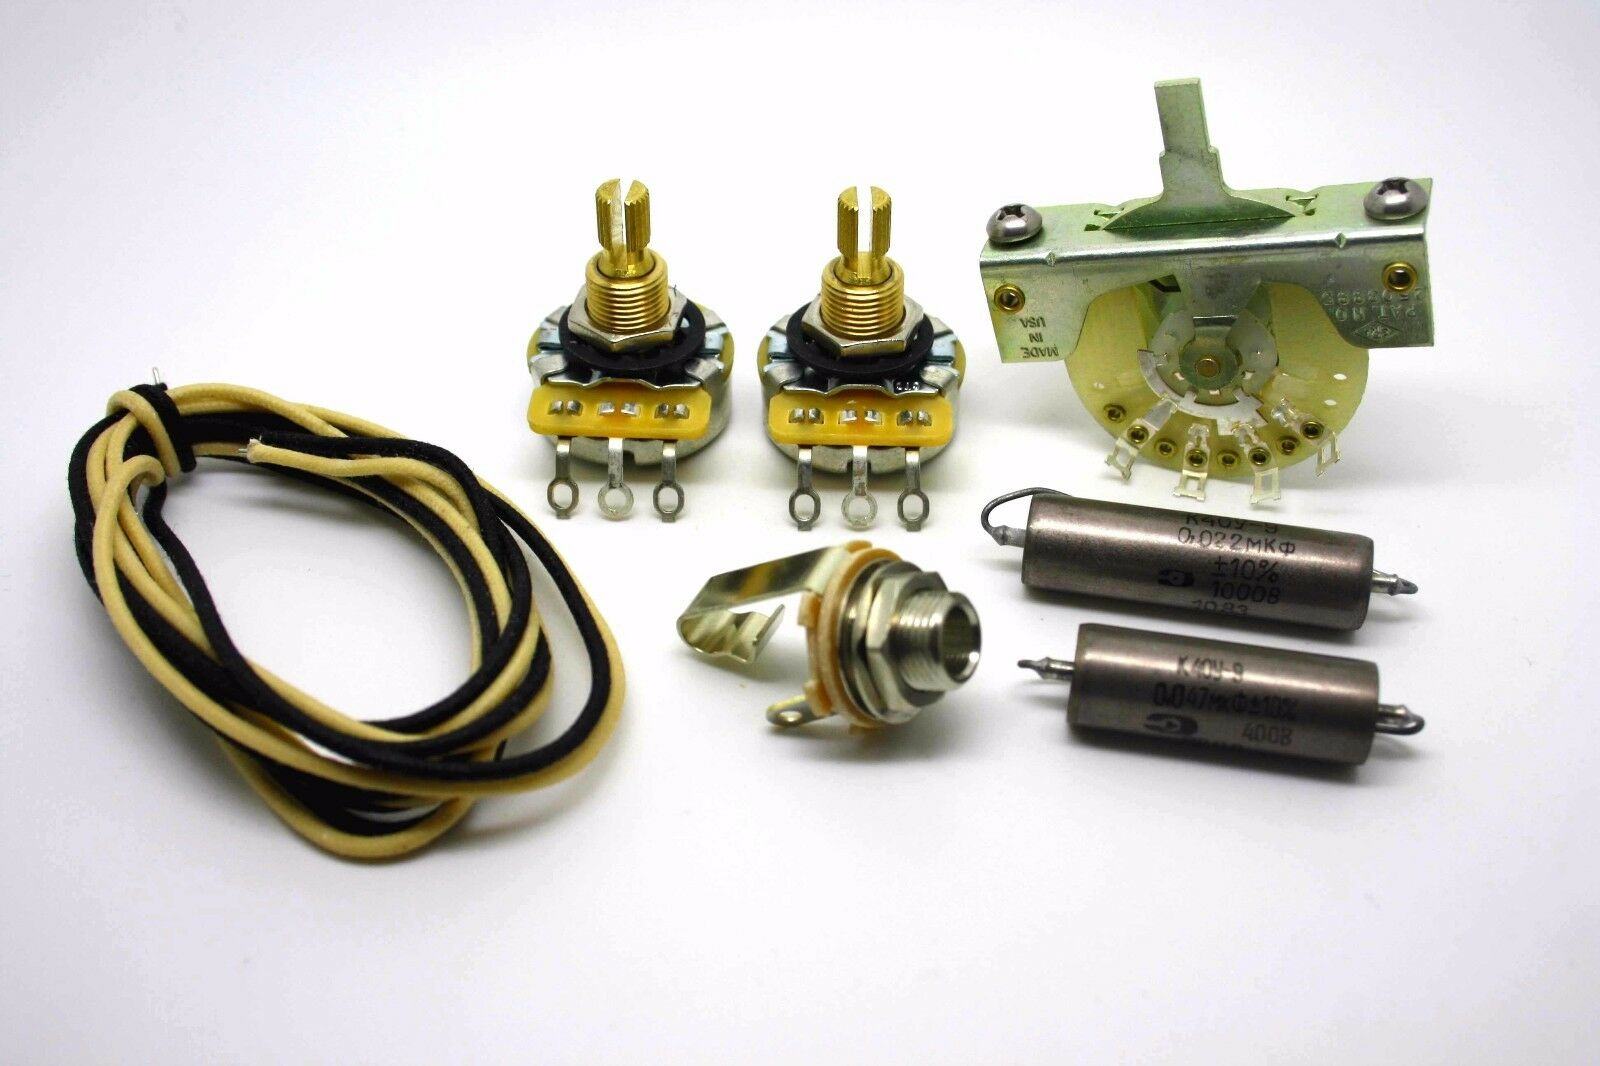 FENDER TELECASTER SUPER WIRING KIT WITH 0.047uf & 0.022uF K40Y-9 PIO